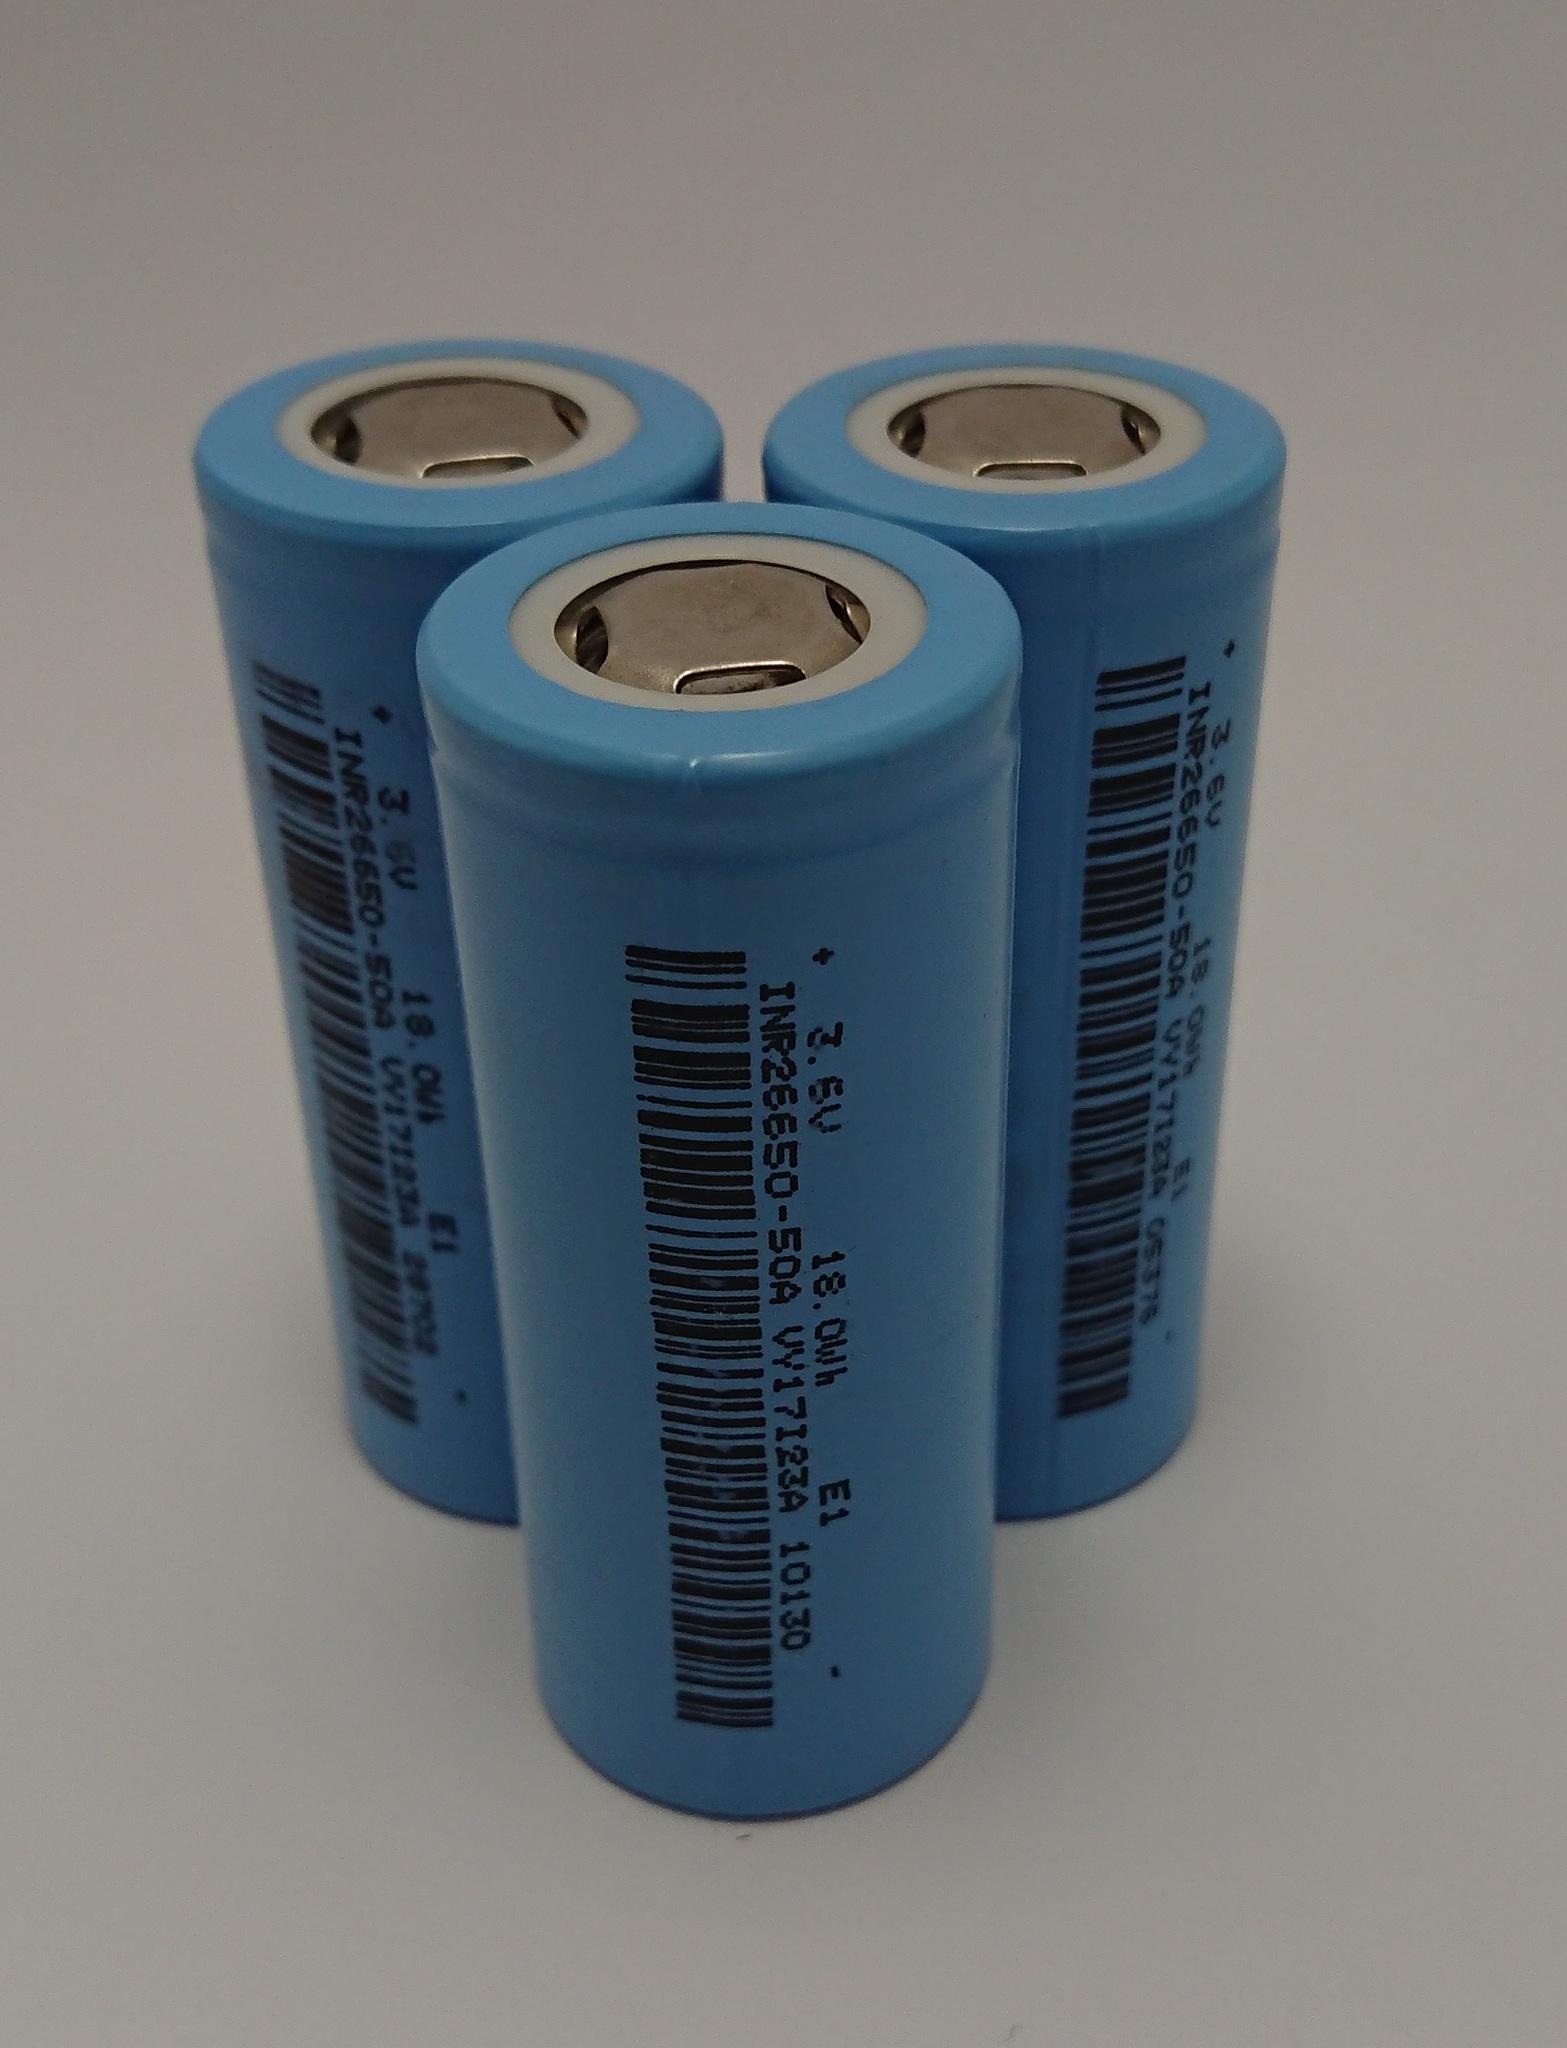 Аккумулятор INR26650 Li-Ion 5000mAh 3.6V 18Wh